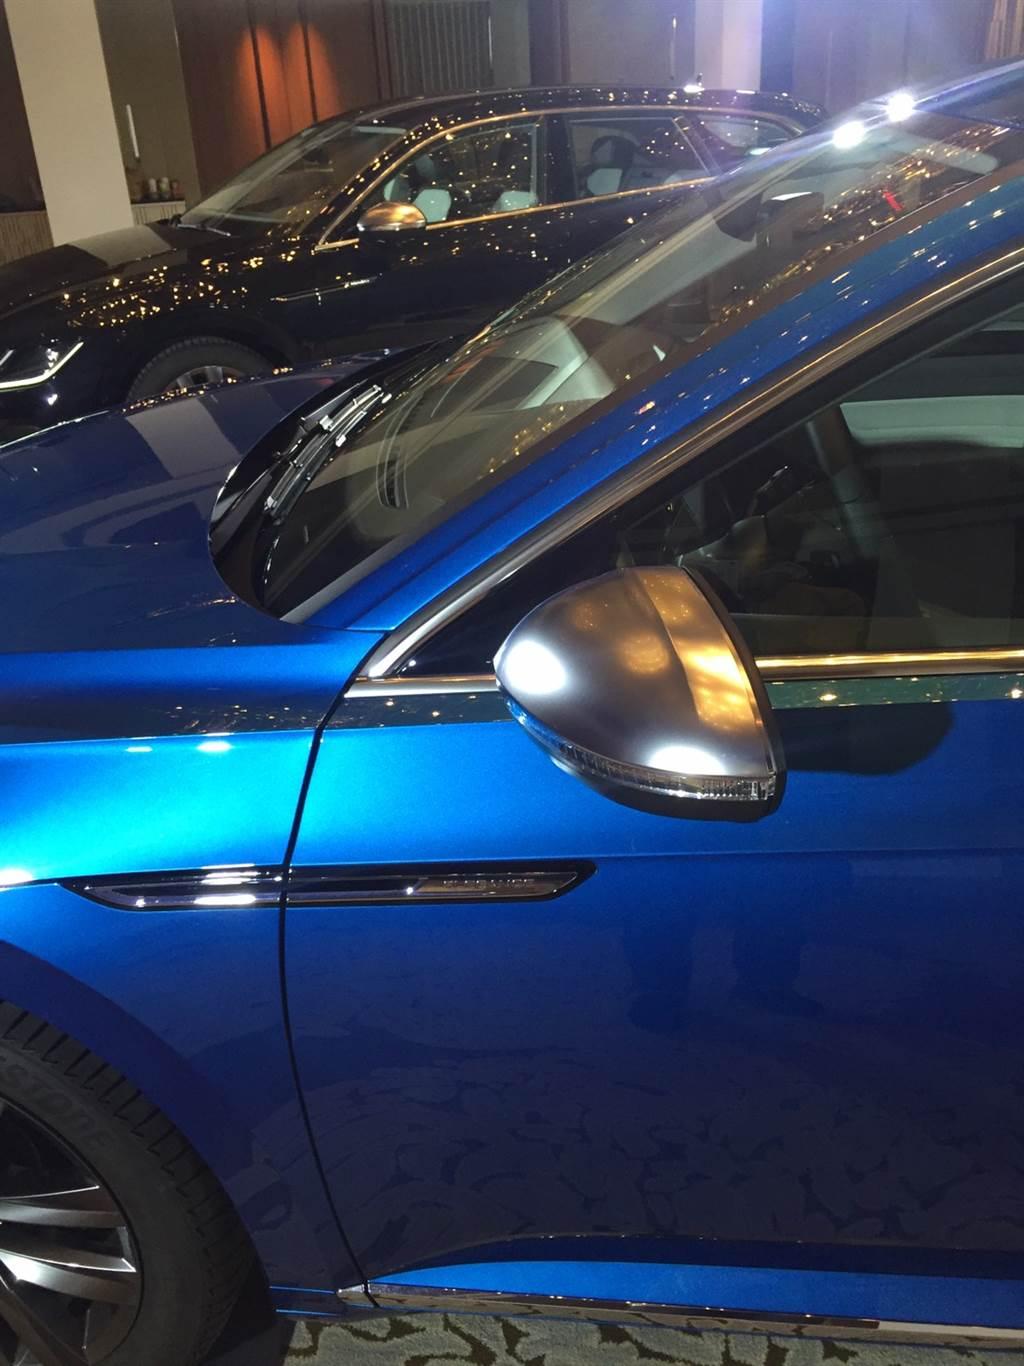 預計 8/21 開啟預售,Volkswagen Arteon/Arteon Shooting Brake 小改款實車在台曝光!